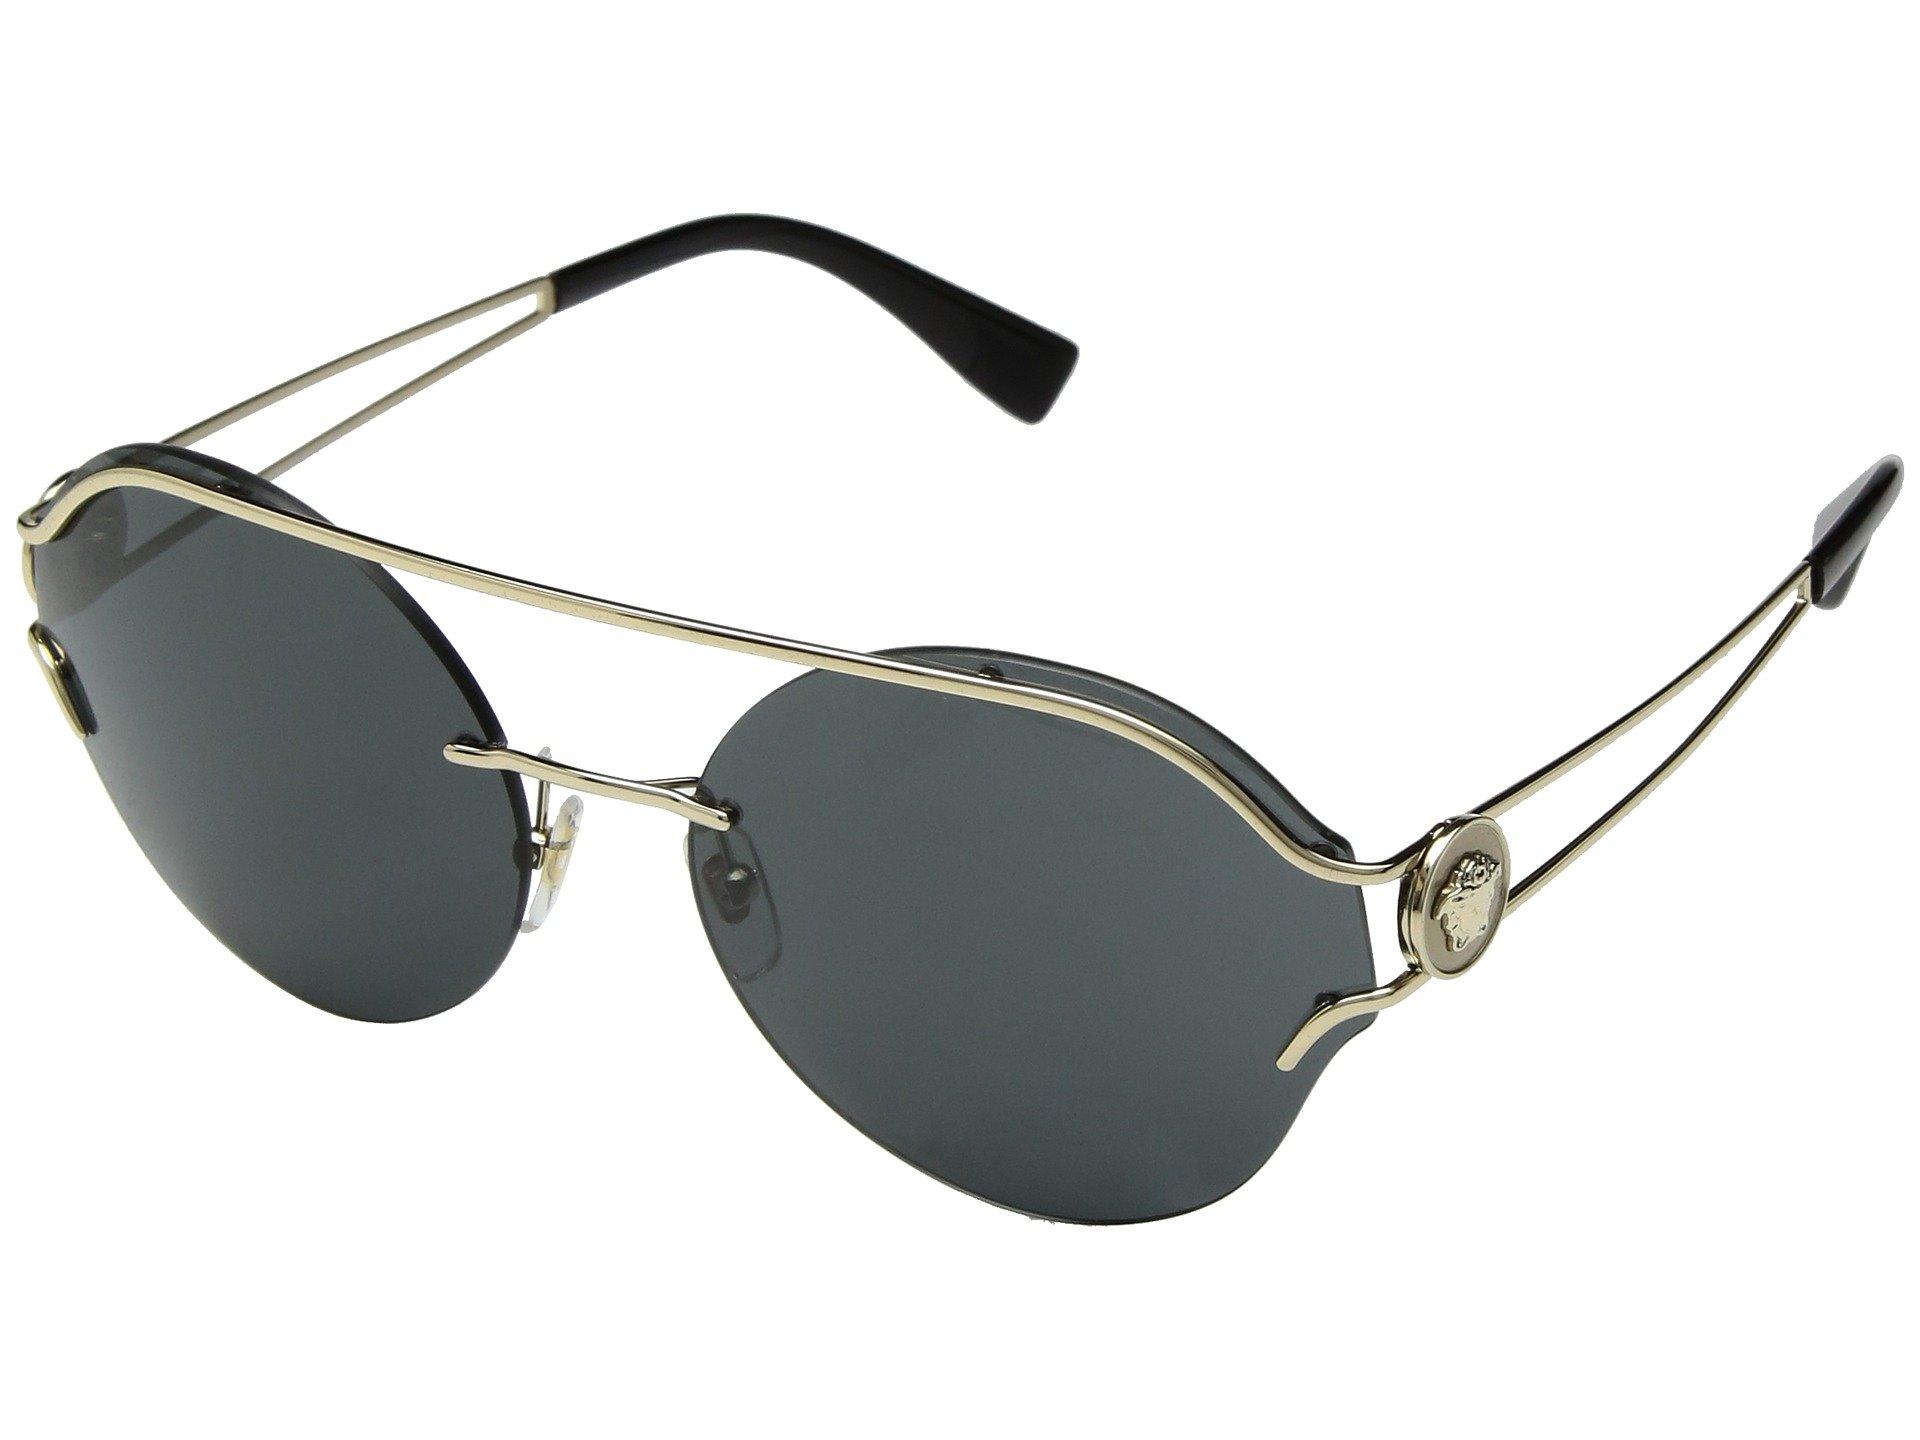 Versace Womens Sunglasses Gold/Grey Metal - Non-Polarized - 61mm